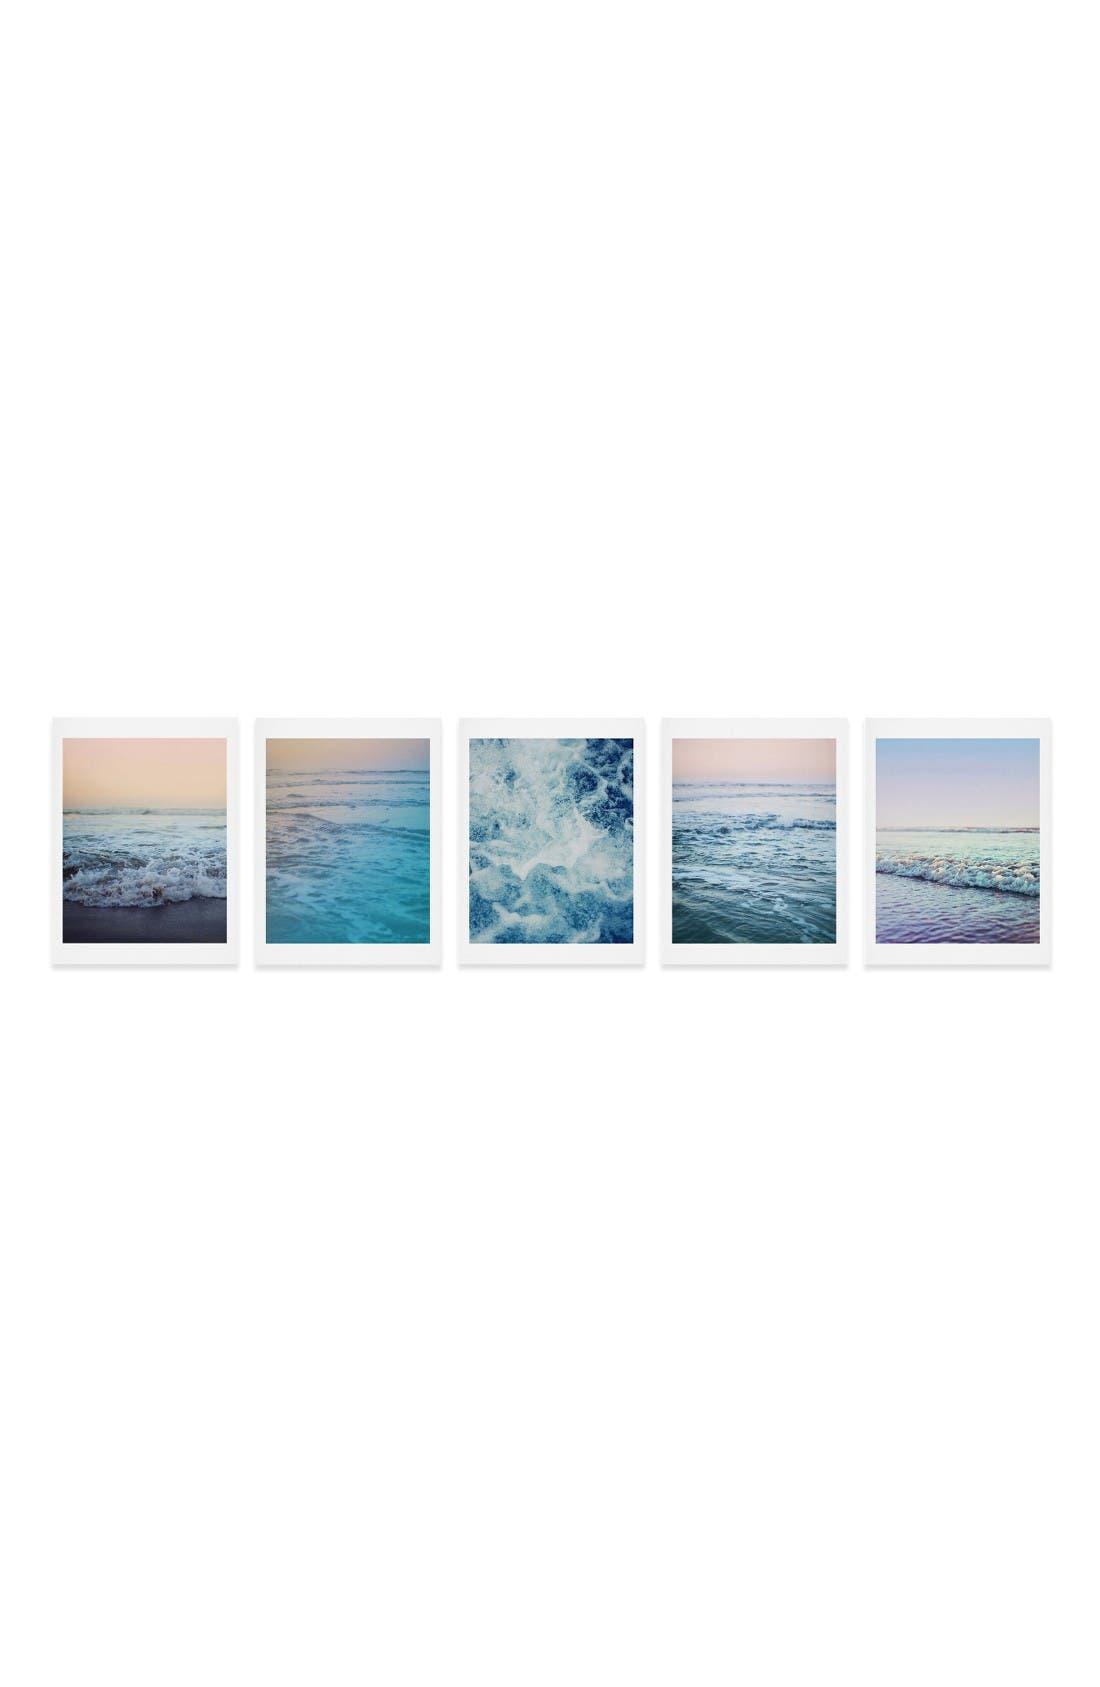 Main Image - Deny Designs Ocean Five-Piece Gallery Wall Art Print Set